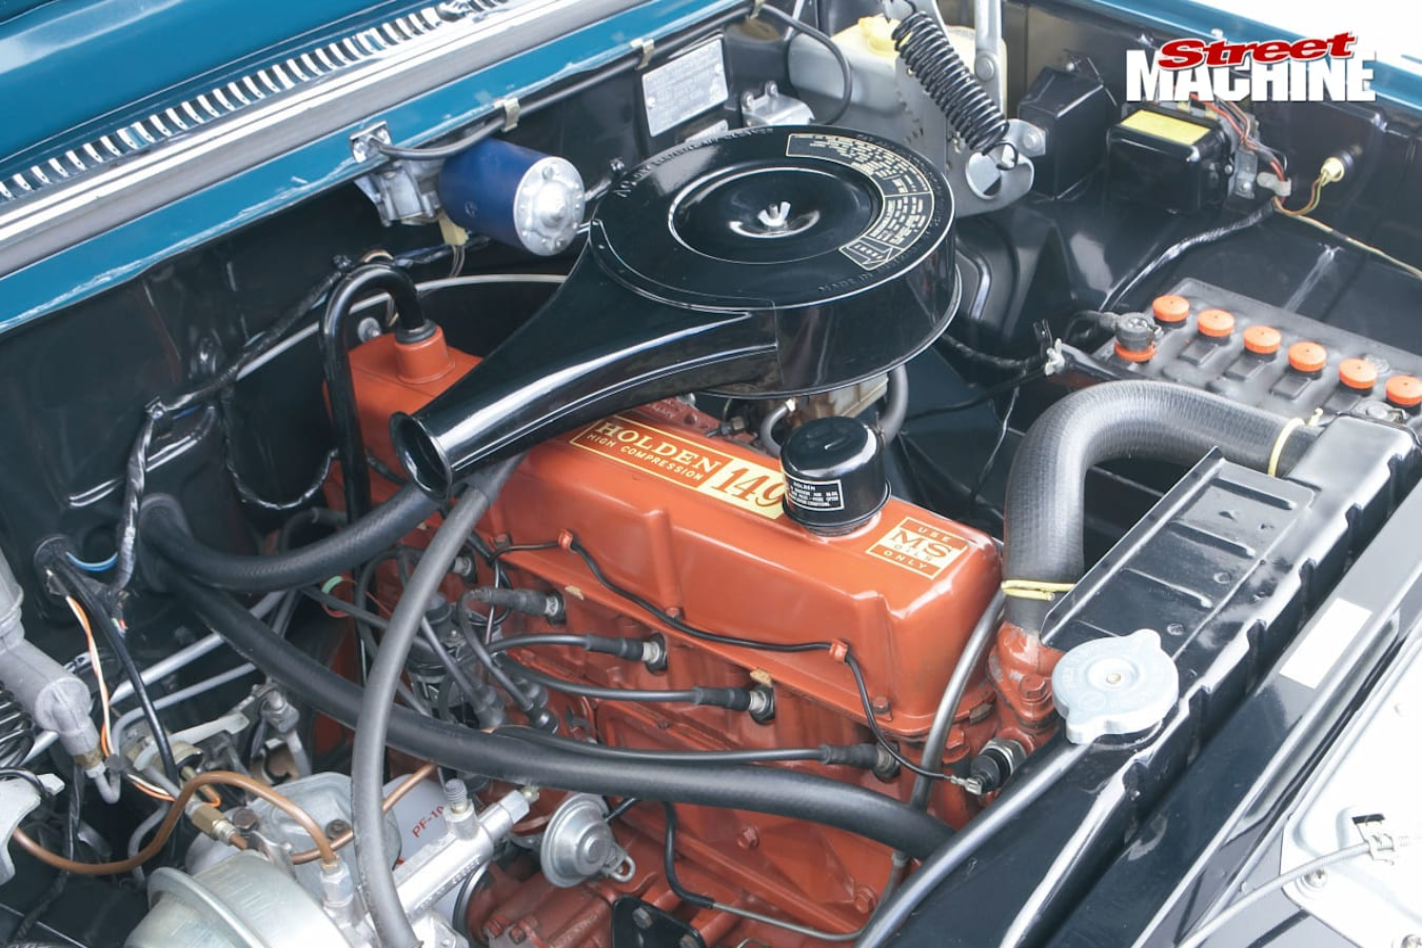 Holden EH engine bay